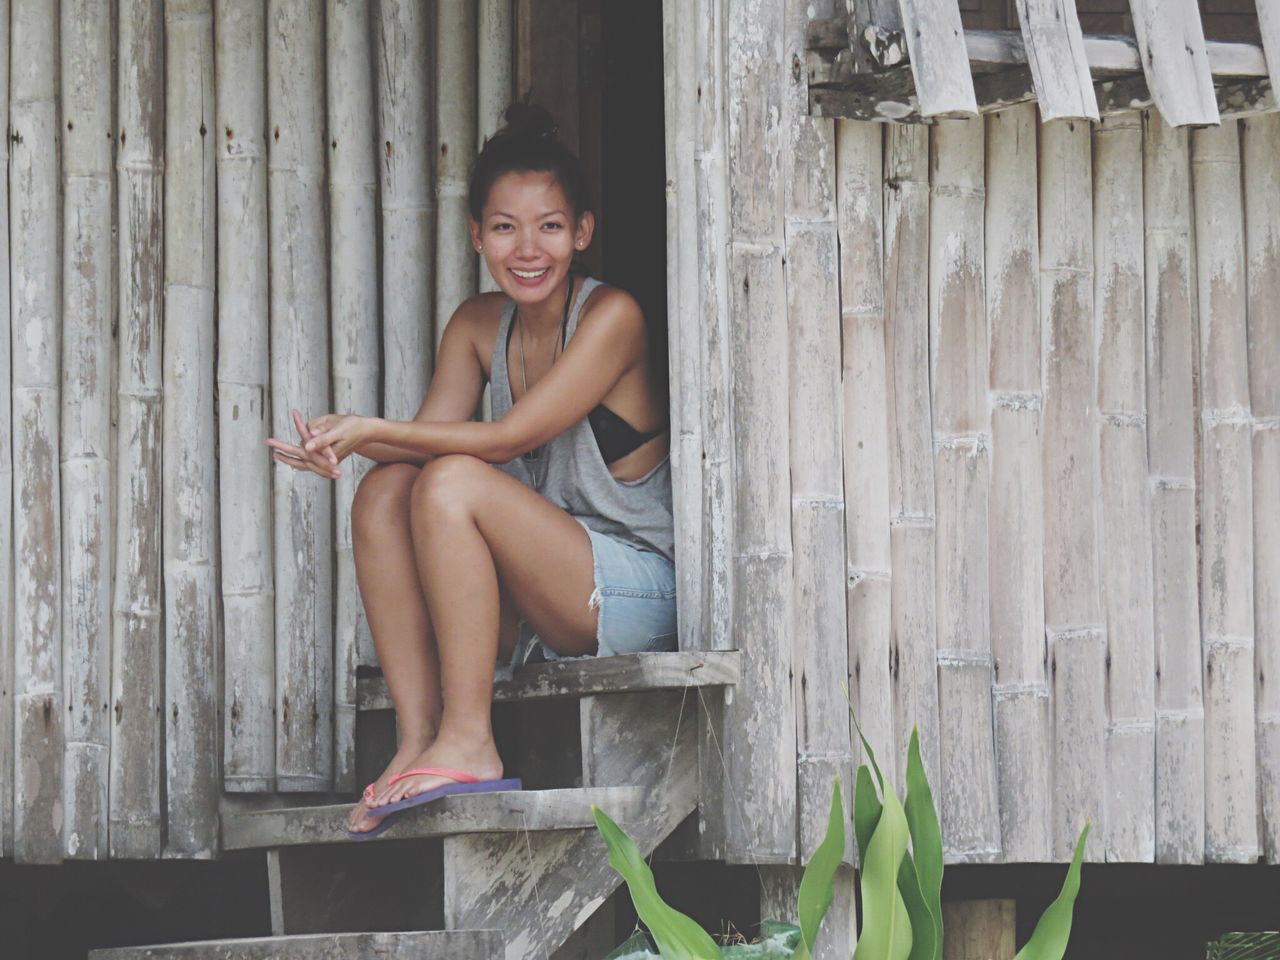 The Portraitist - 2016 EyeEm Awards Portrait Portrait Of A Woman Portrait Of A Friend Portraits Portrait Photography Filipina Filipina Beauty Modern Filipina Dalagang Pilipina Beautiful Woman Pretty Woman Eyeem Philippines Nipa Hut Bahay Kubo Girl Power